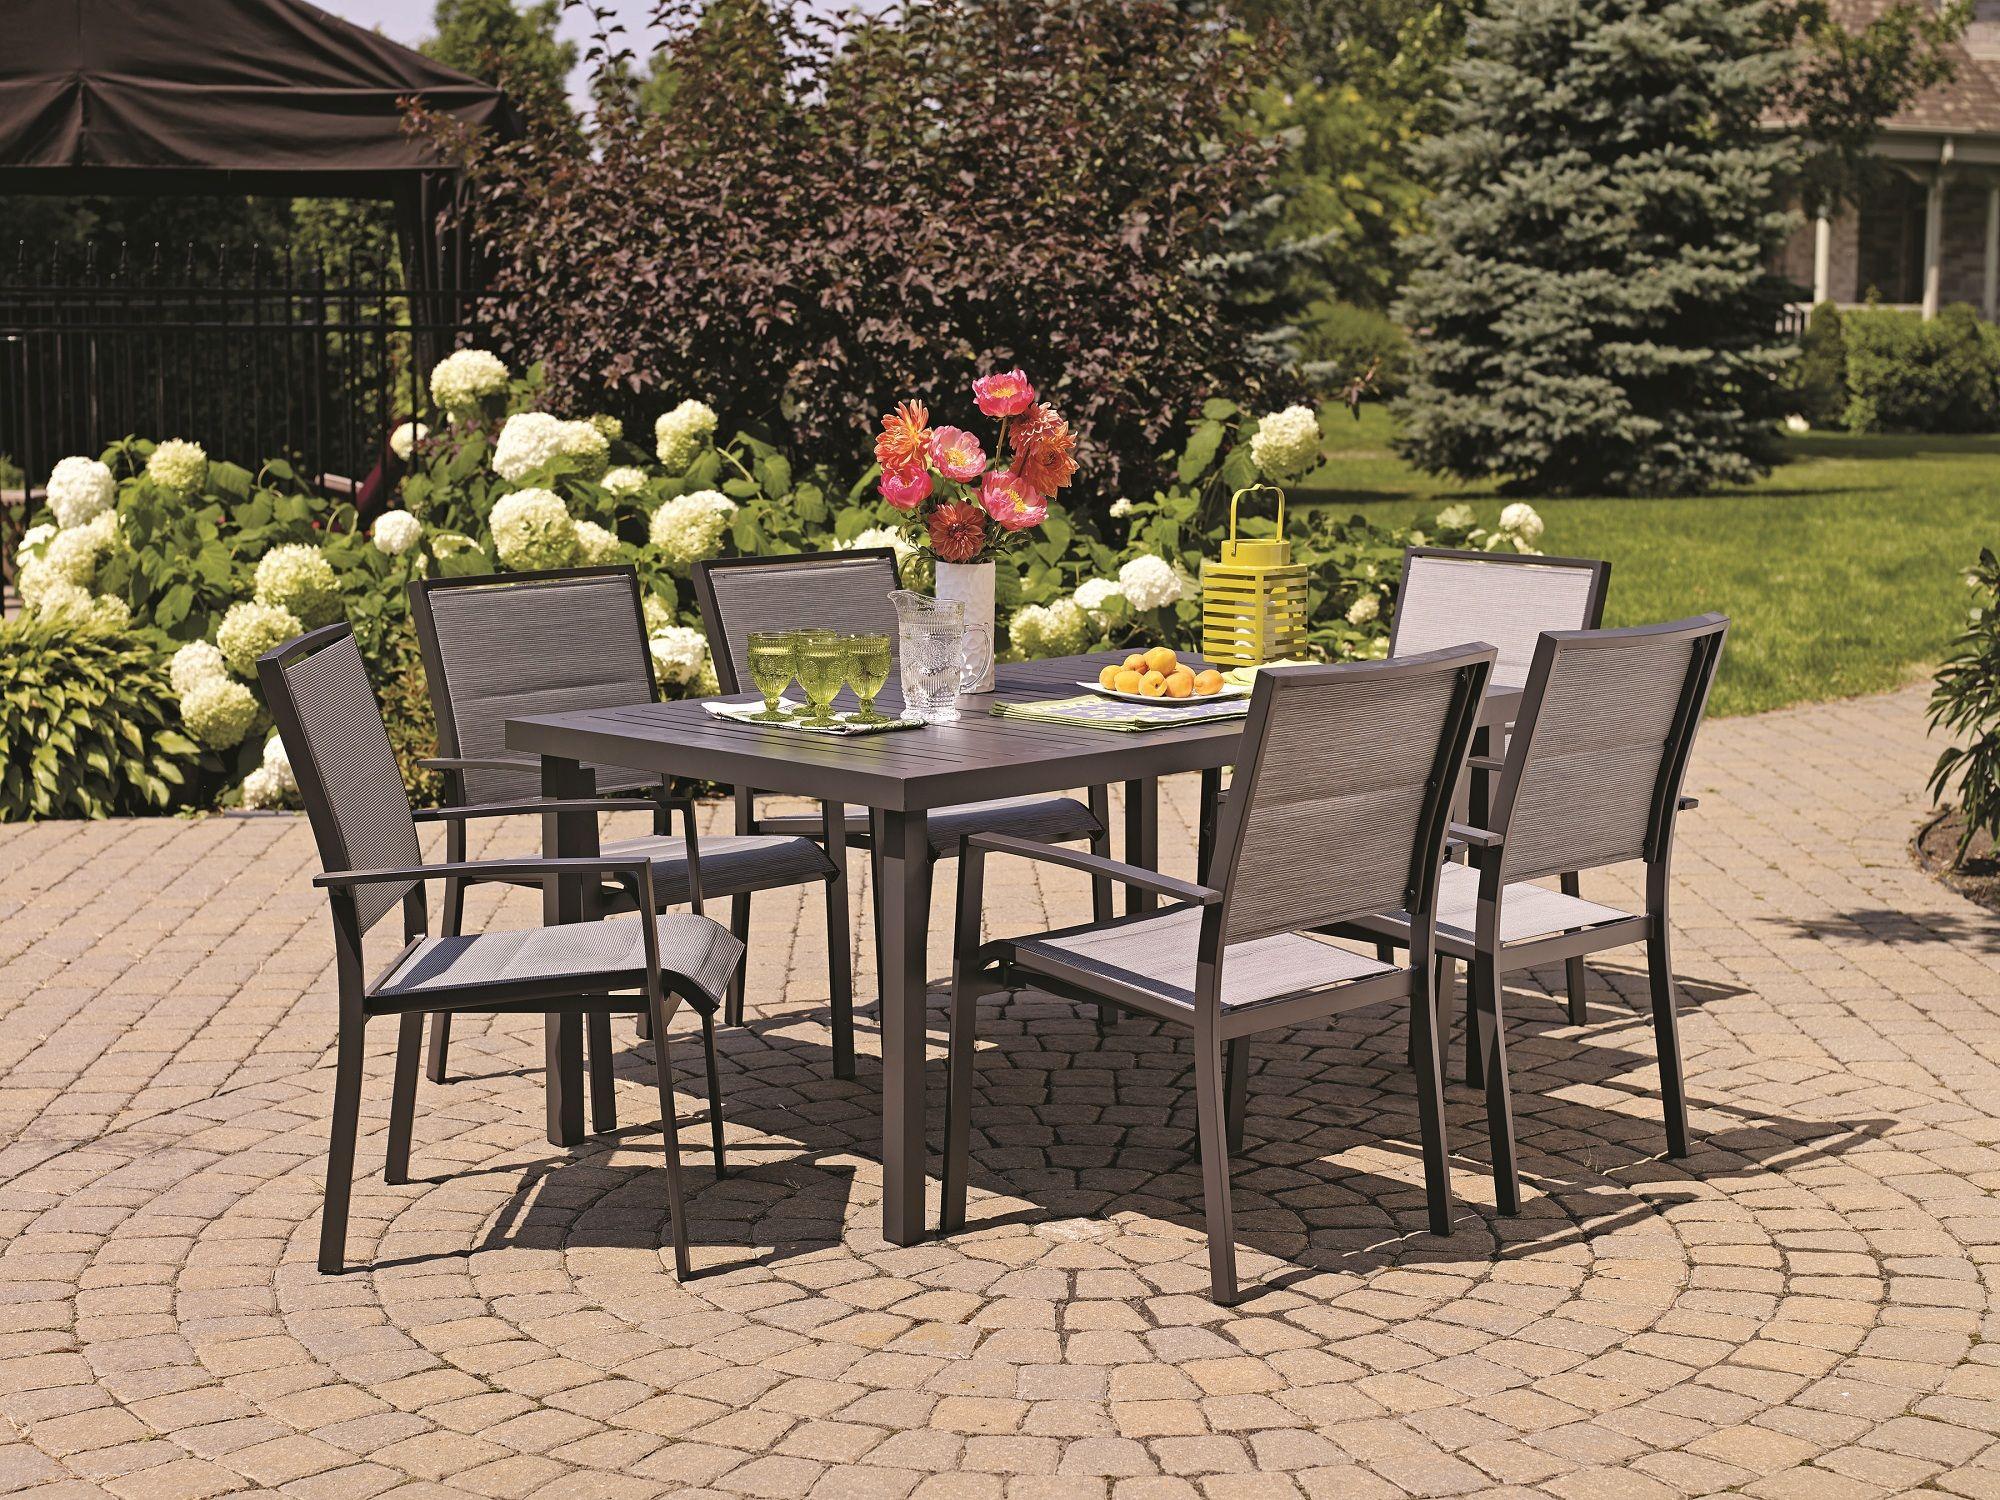 Gentil Outdoor And Garden: Decks, Furniture, Gardening, Snow Shovels And Much More